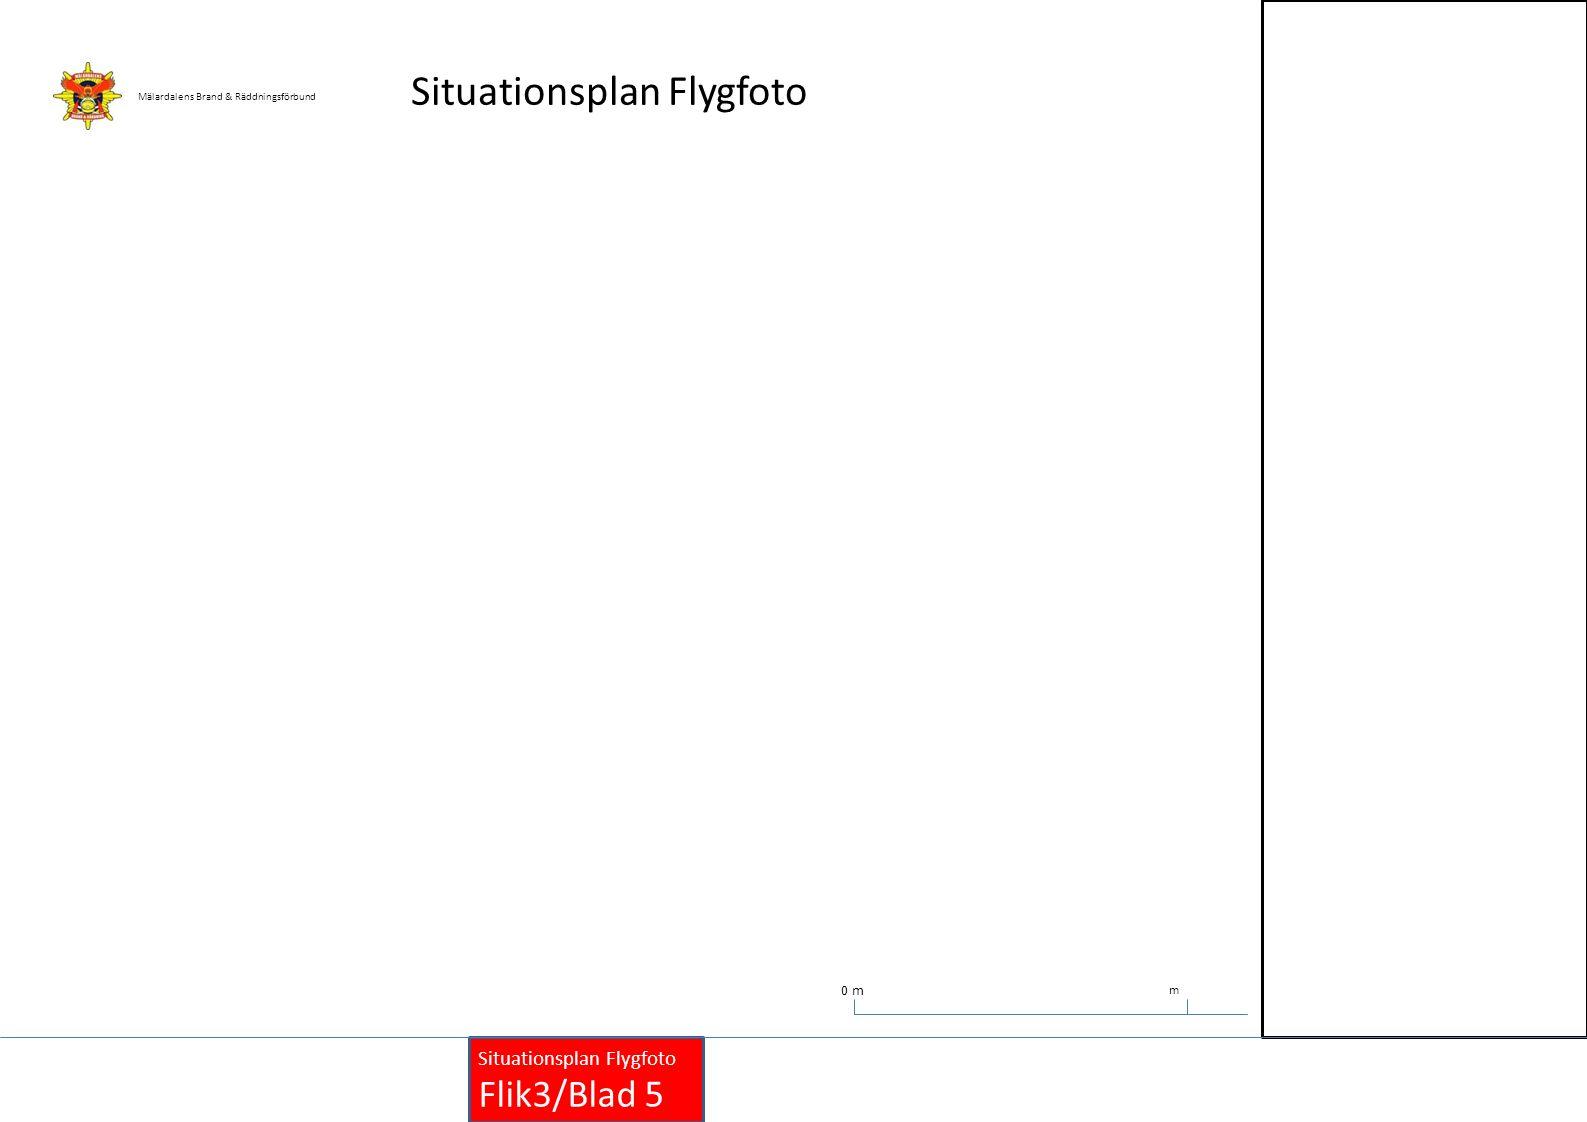 Mälardalens Brand & Räddningsförbund 0 m Situationsplan Flygfoto Flik3/Blad 5 m